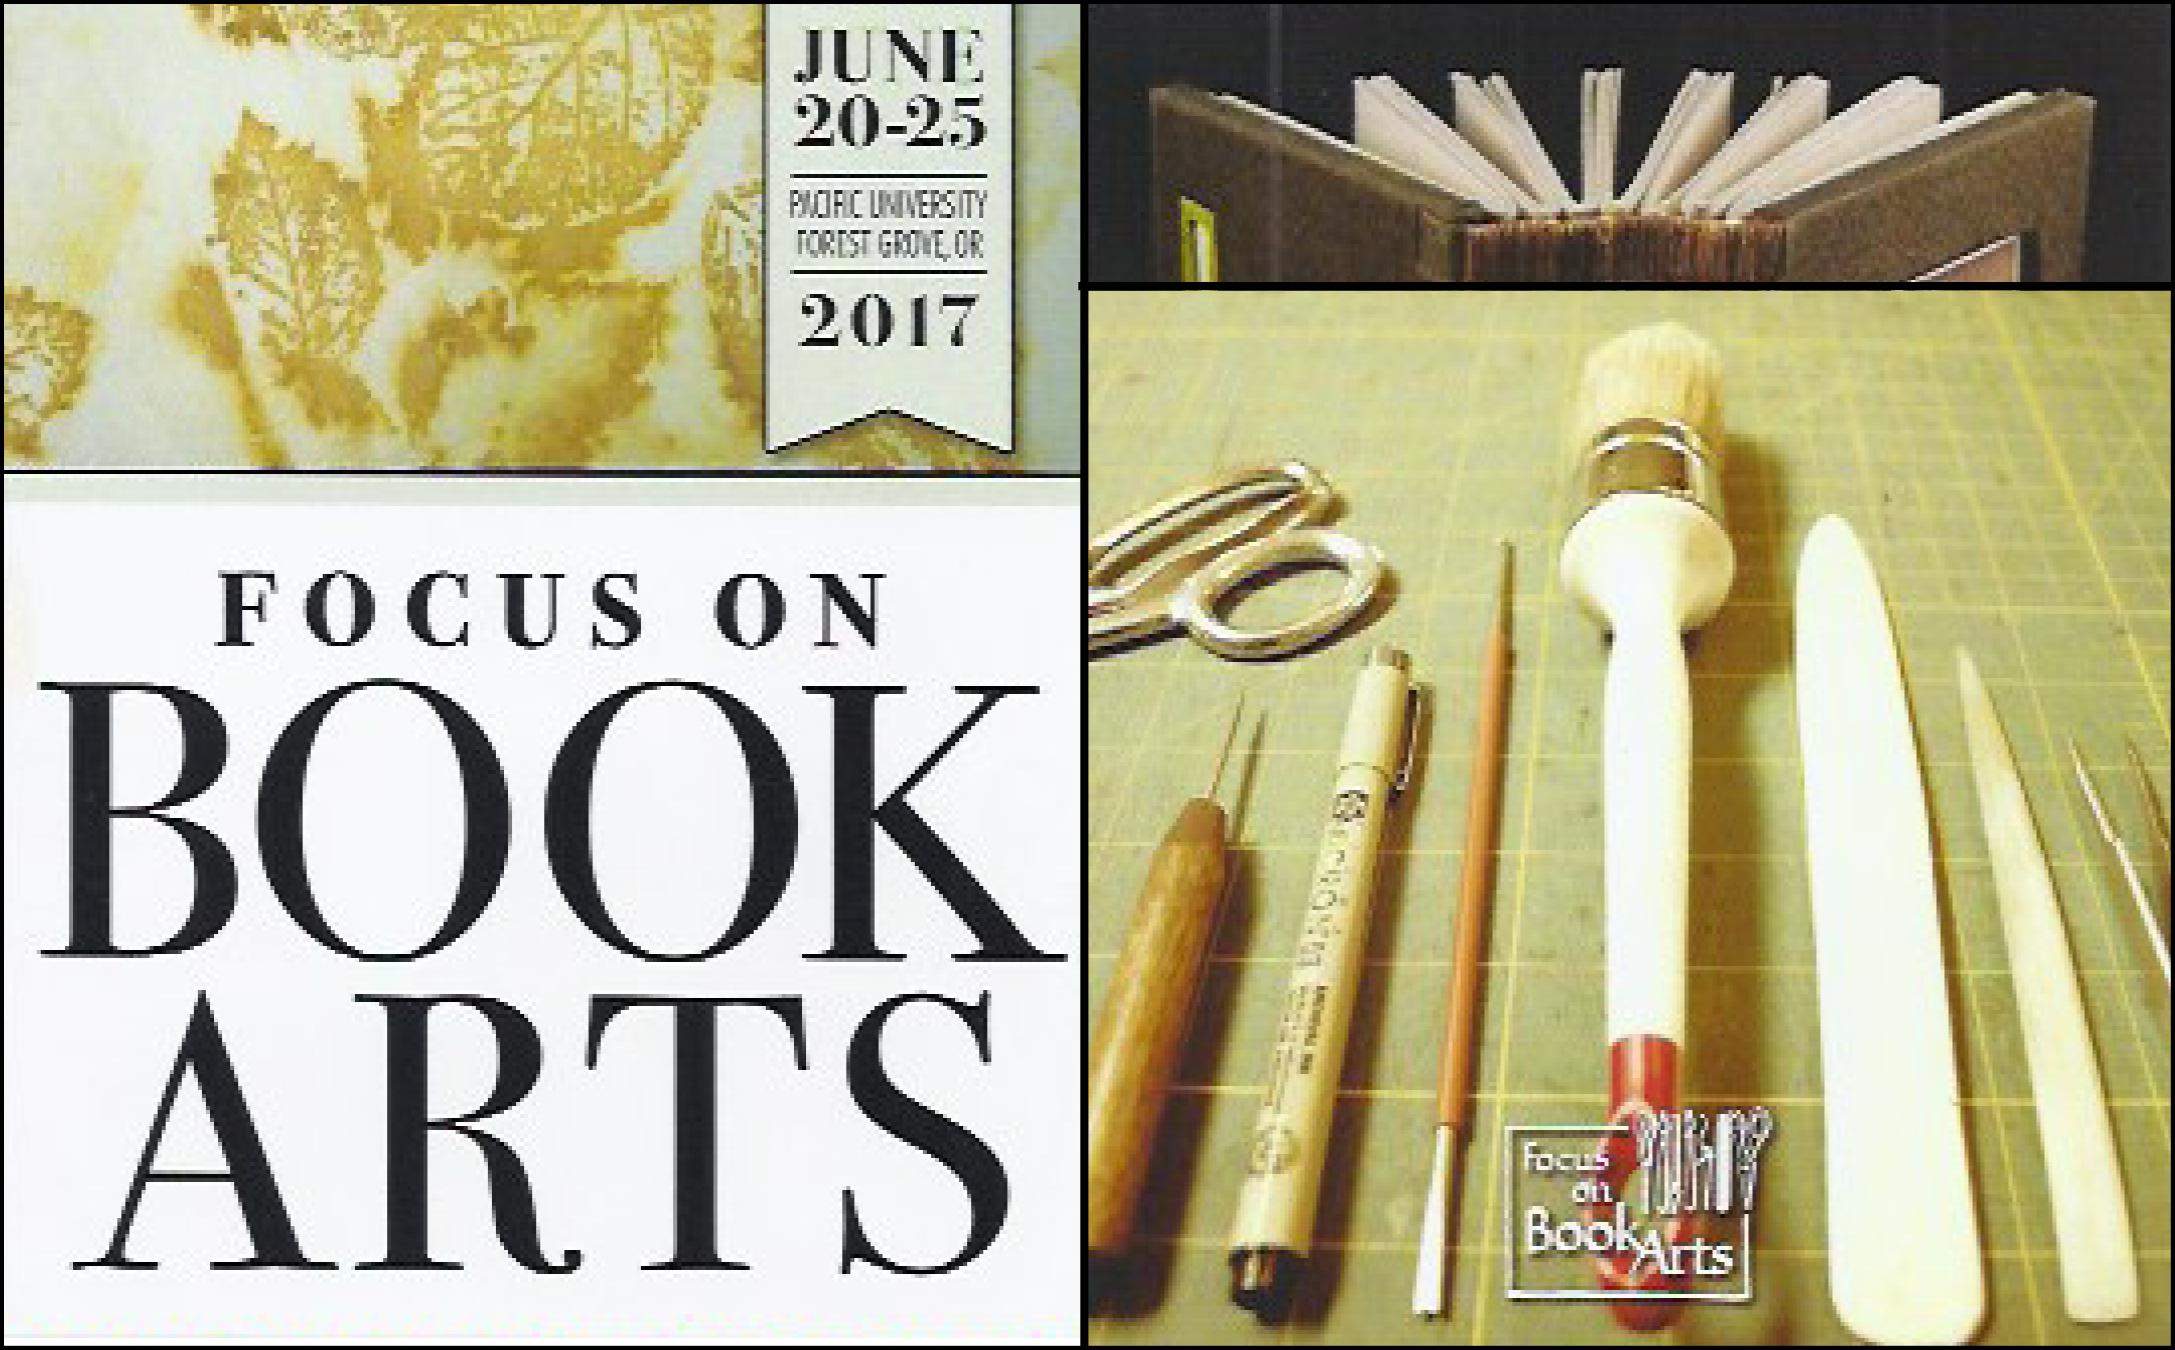 Focus on Books Arts 2017   Visit Washi Arts at the Trade Fair